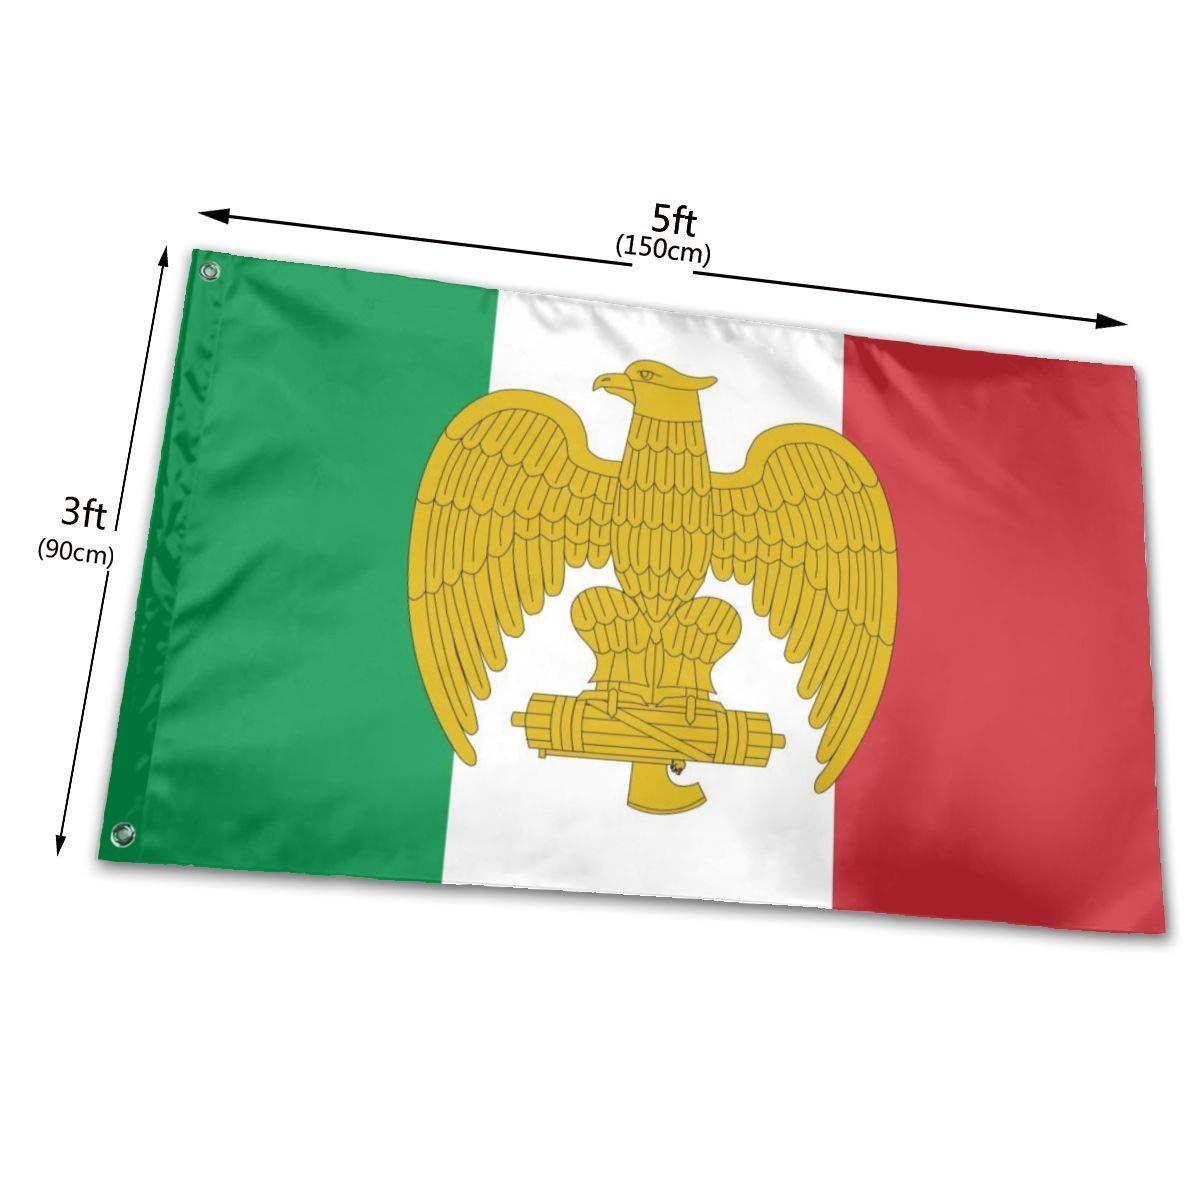 Gsixgoods Bandera Bandera De La Italia Fascista Flags 3x5 Feet -Nylon Flags with Bright Vivid Color and Premium Material for Outdoor, Longest Lasting for Outside(Breeze Style): Amazon.es: Jardín